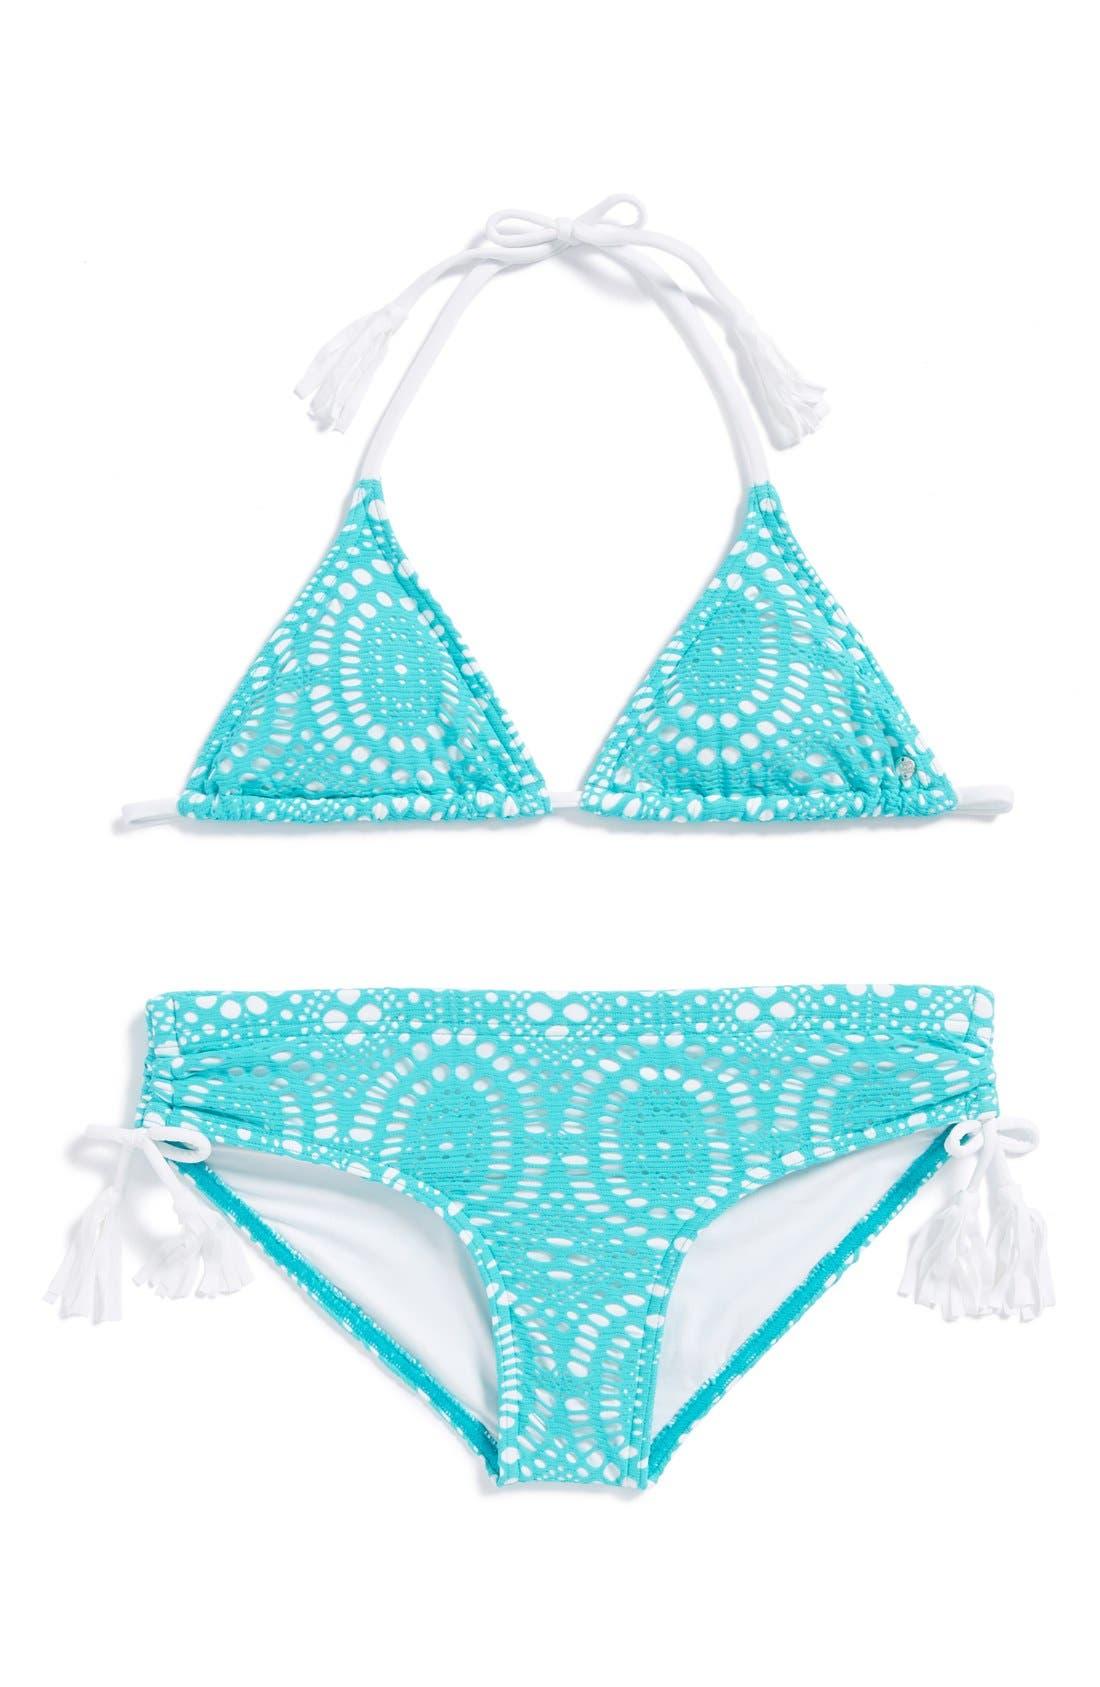 Main Image - Billabong Crochet Texture Triangle Bikini Two-Piece Swimsuit (Big Girls)